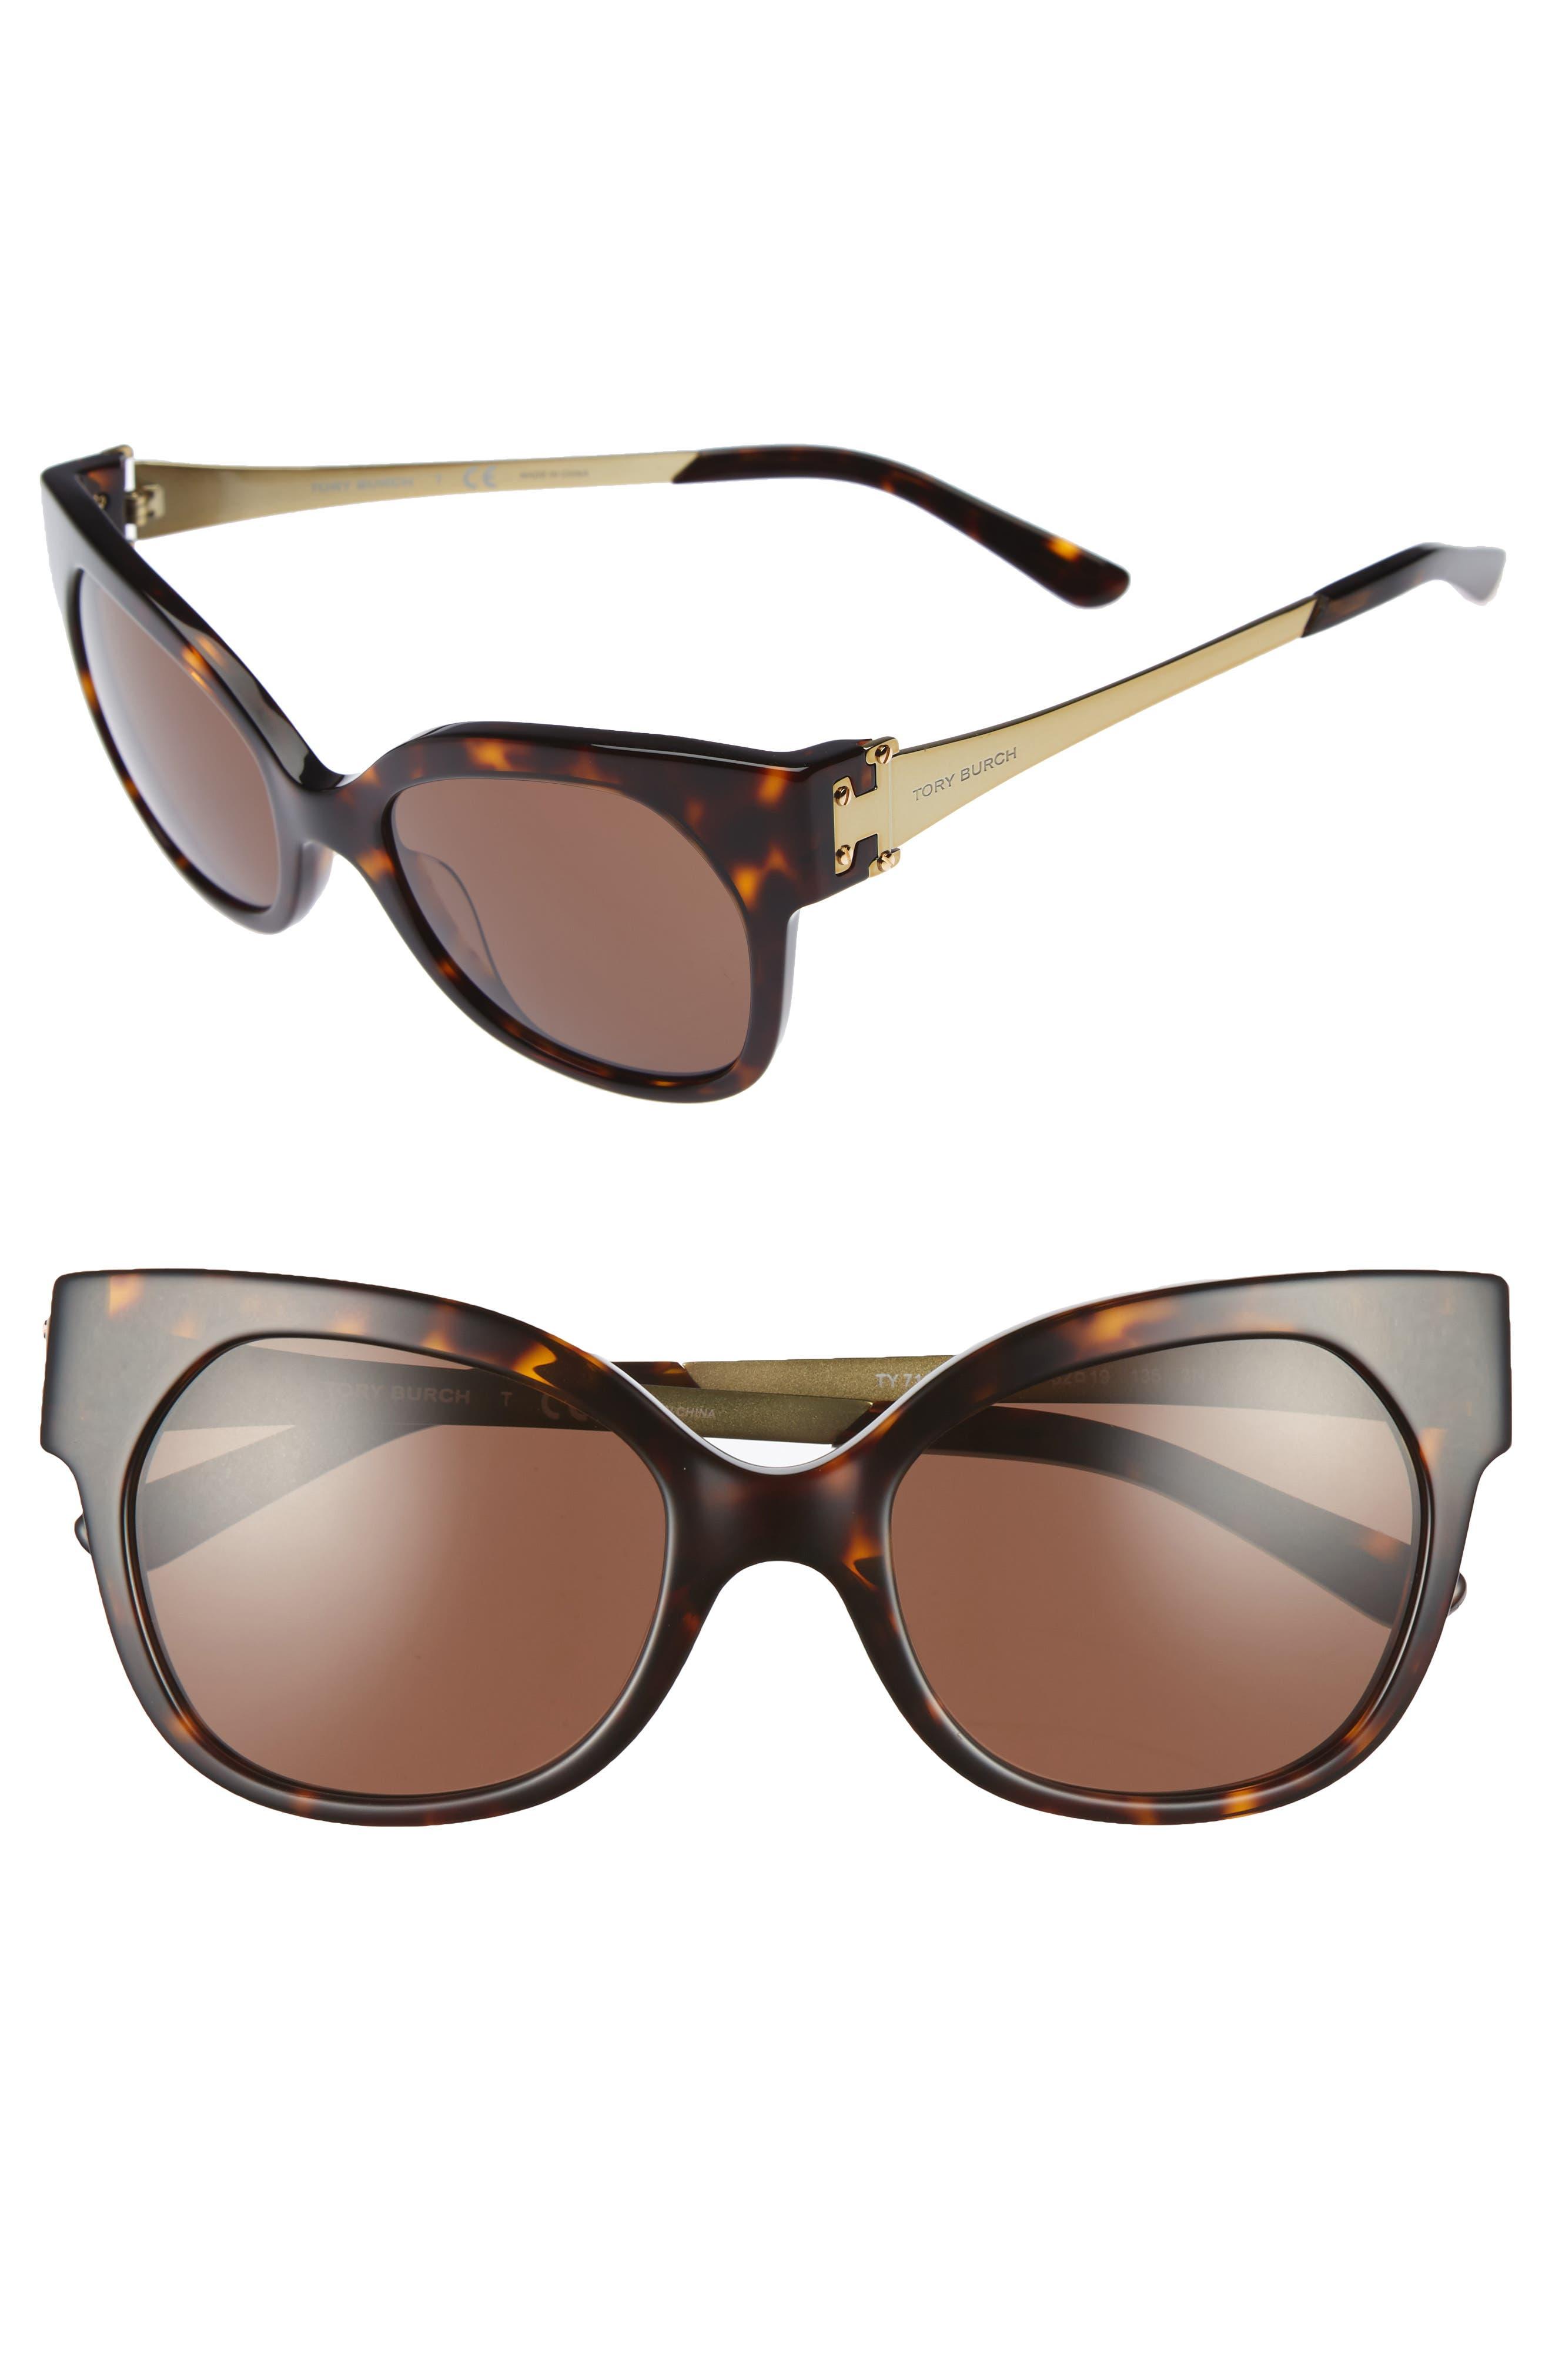 Tory Burch 52mm Cat Eye Sunglasses